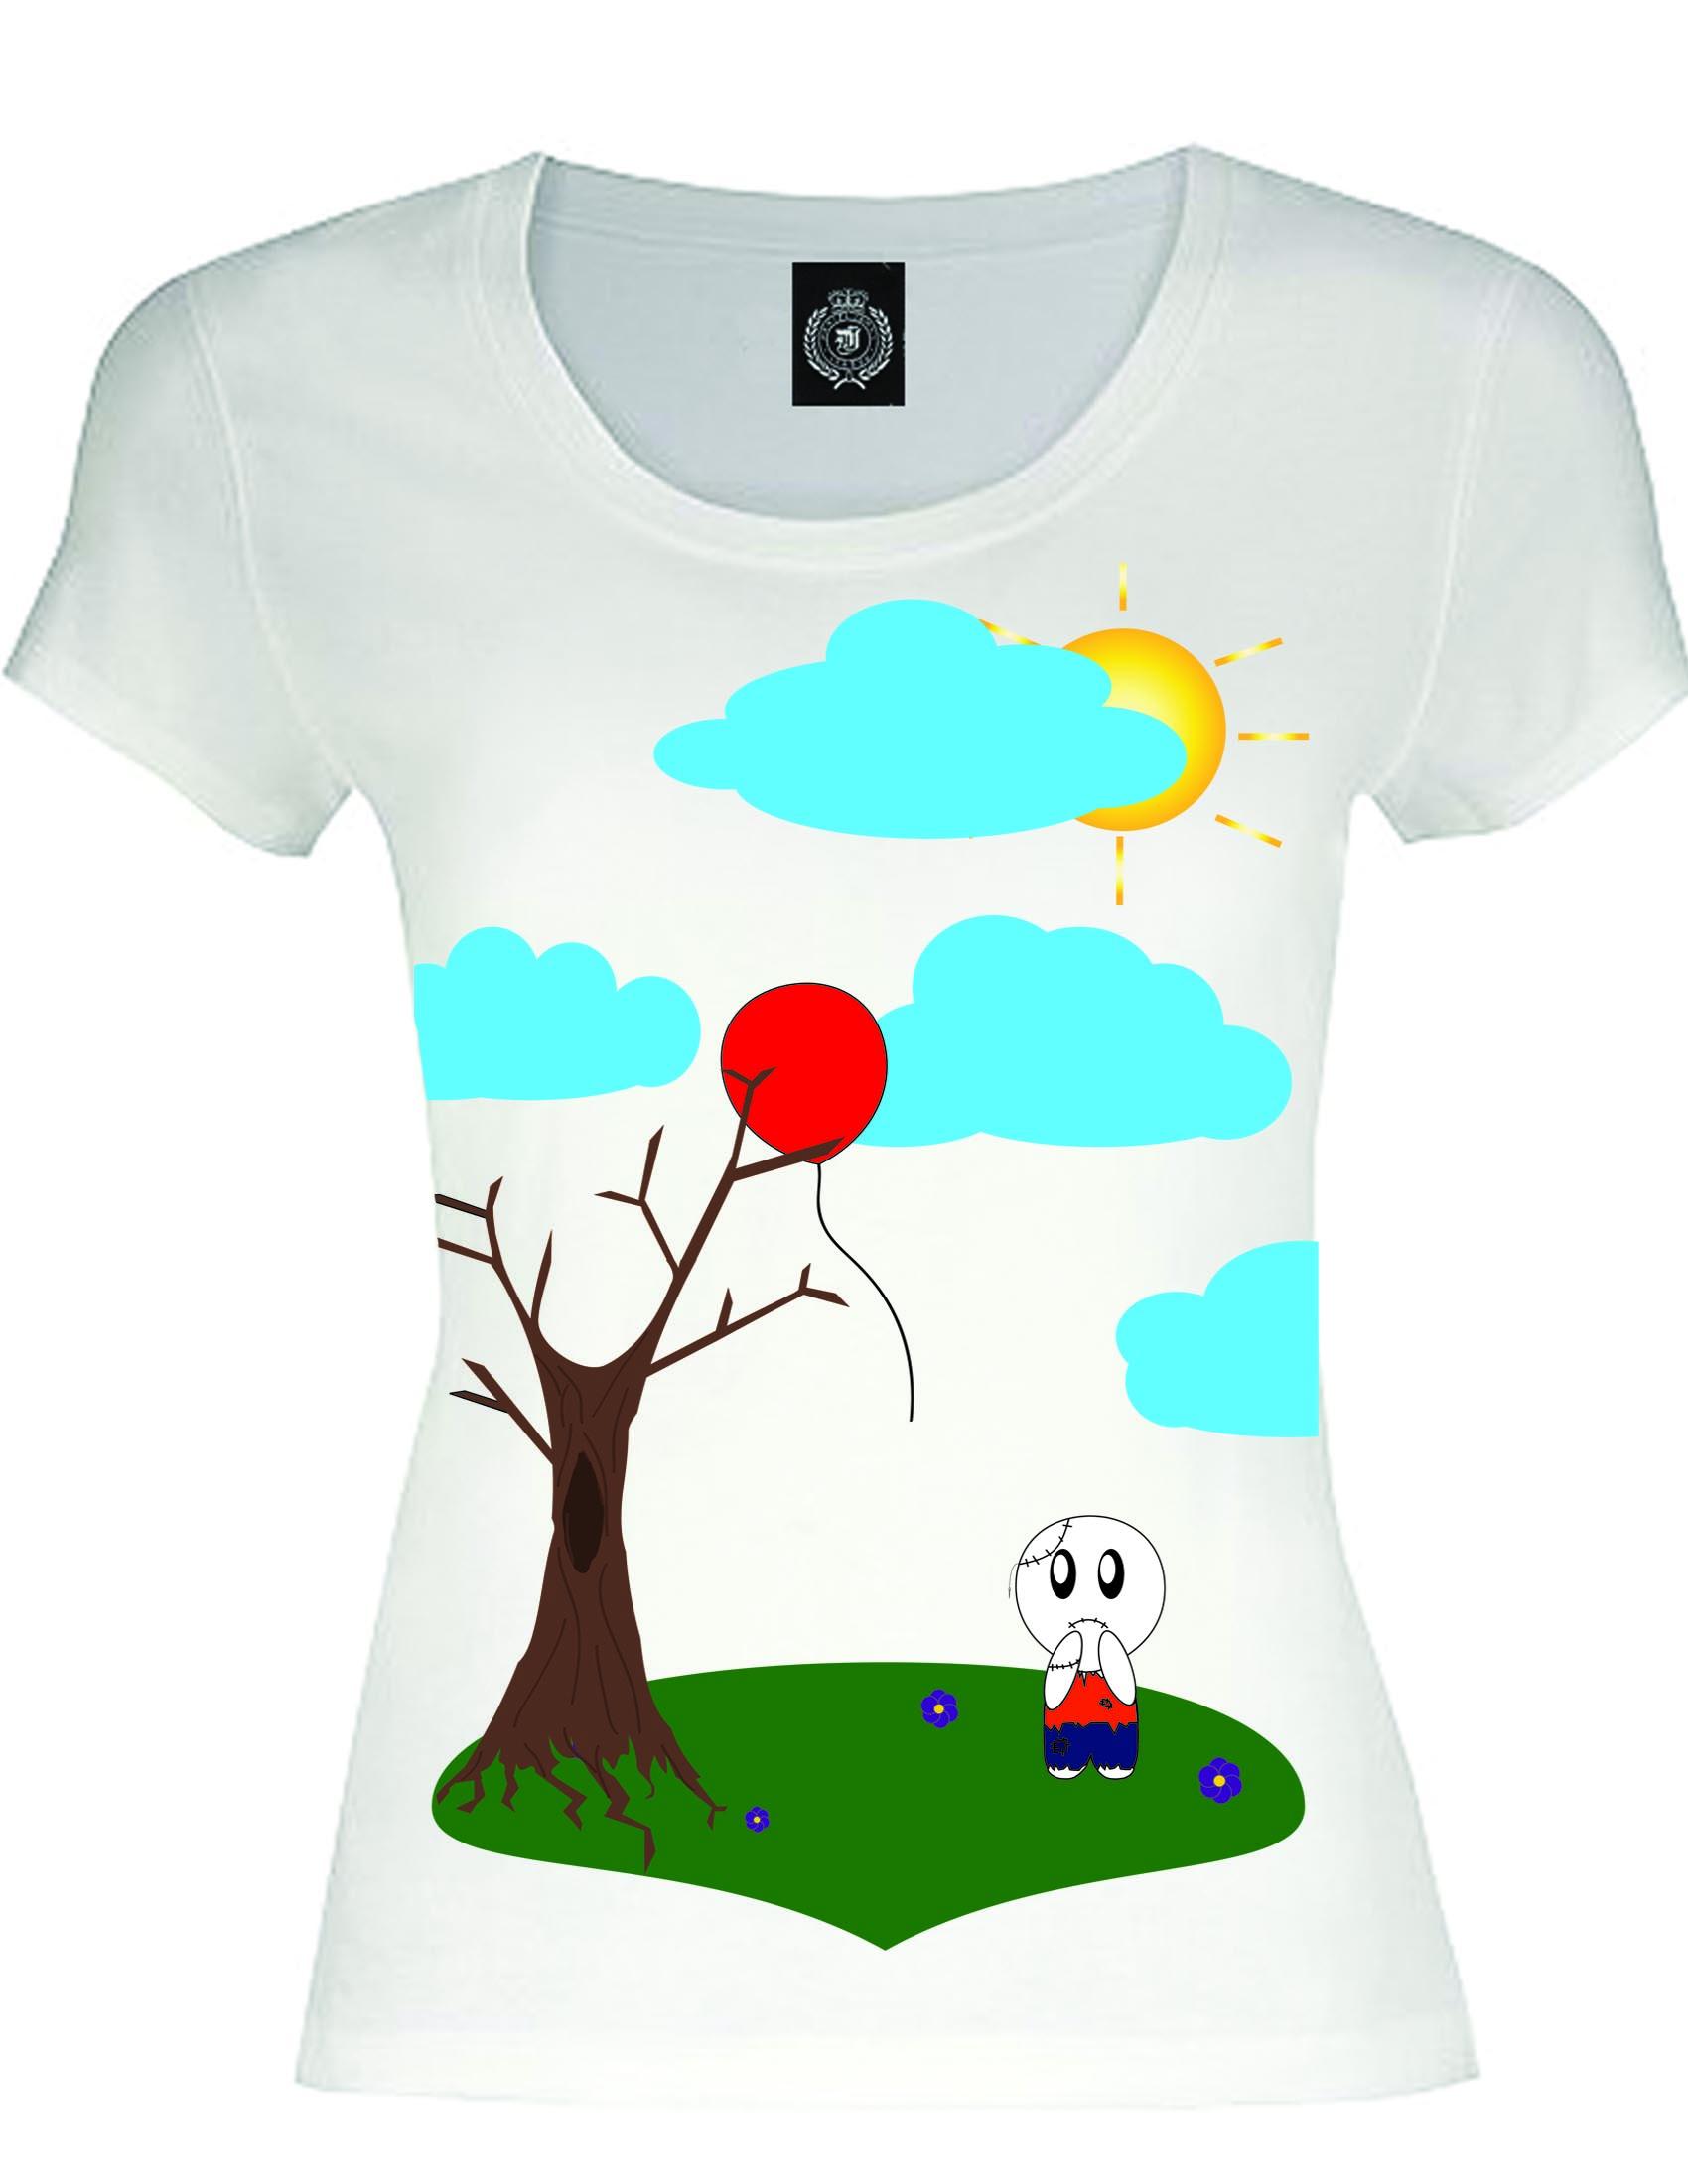 Tshirt Design ideas  irwinleah